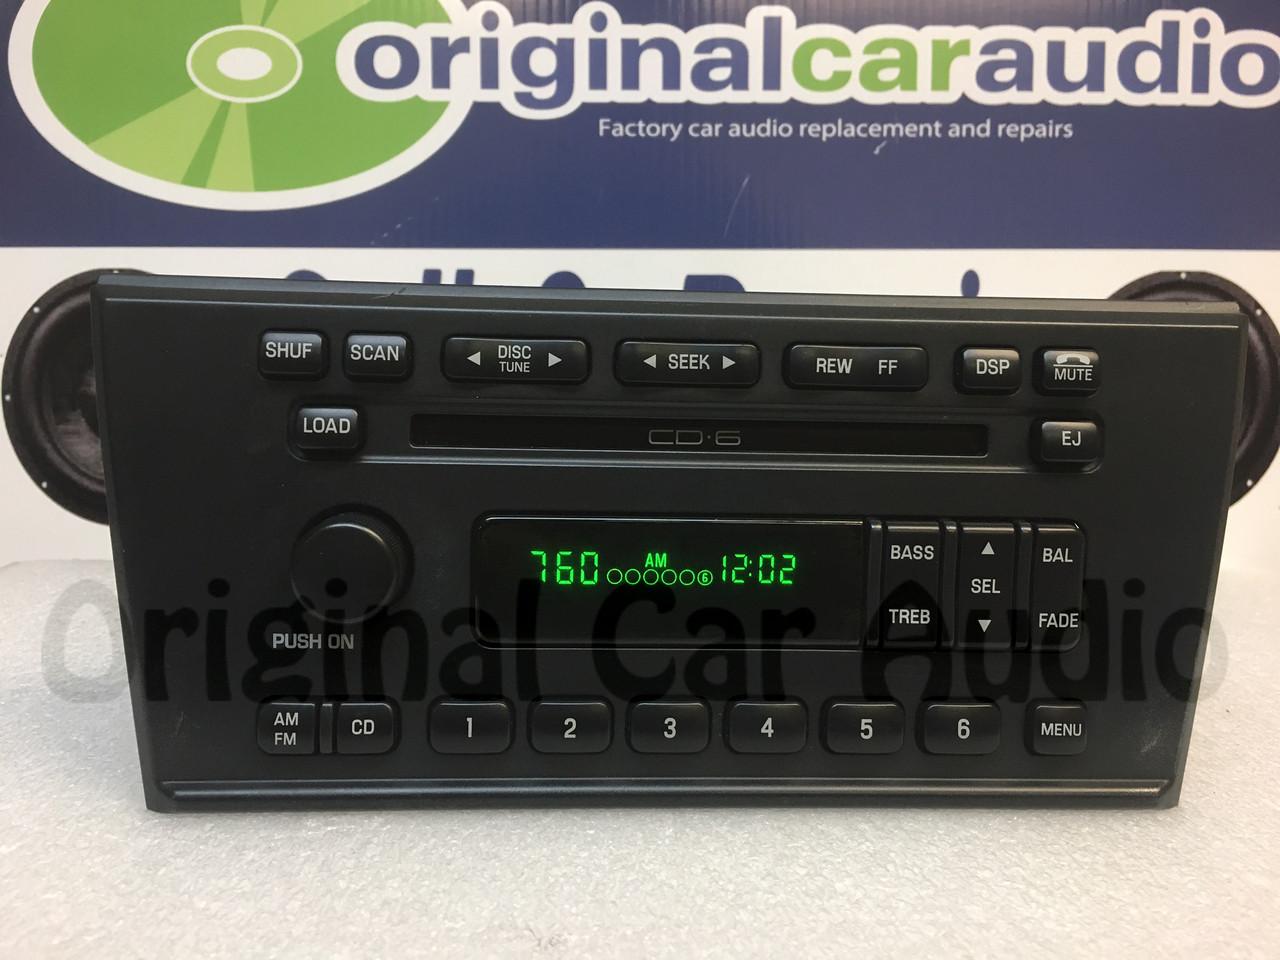 2000 2006 ford thunderbird radio 6 cd changer  [ 1280 x 960 Pixel ]